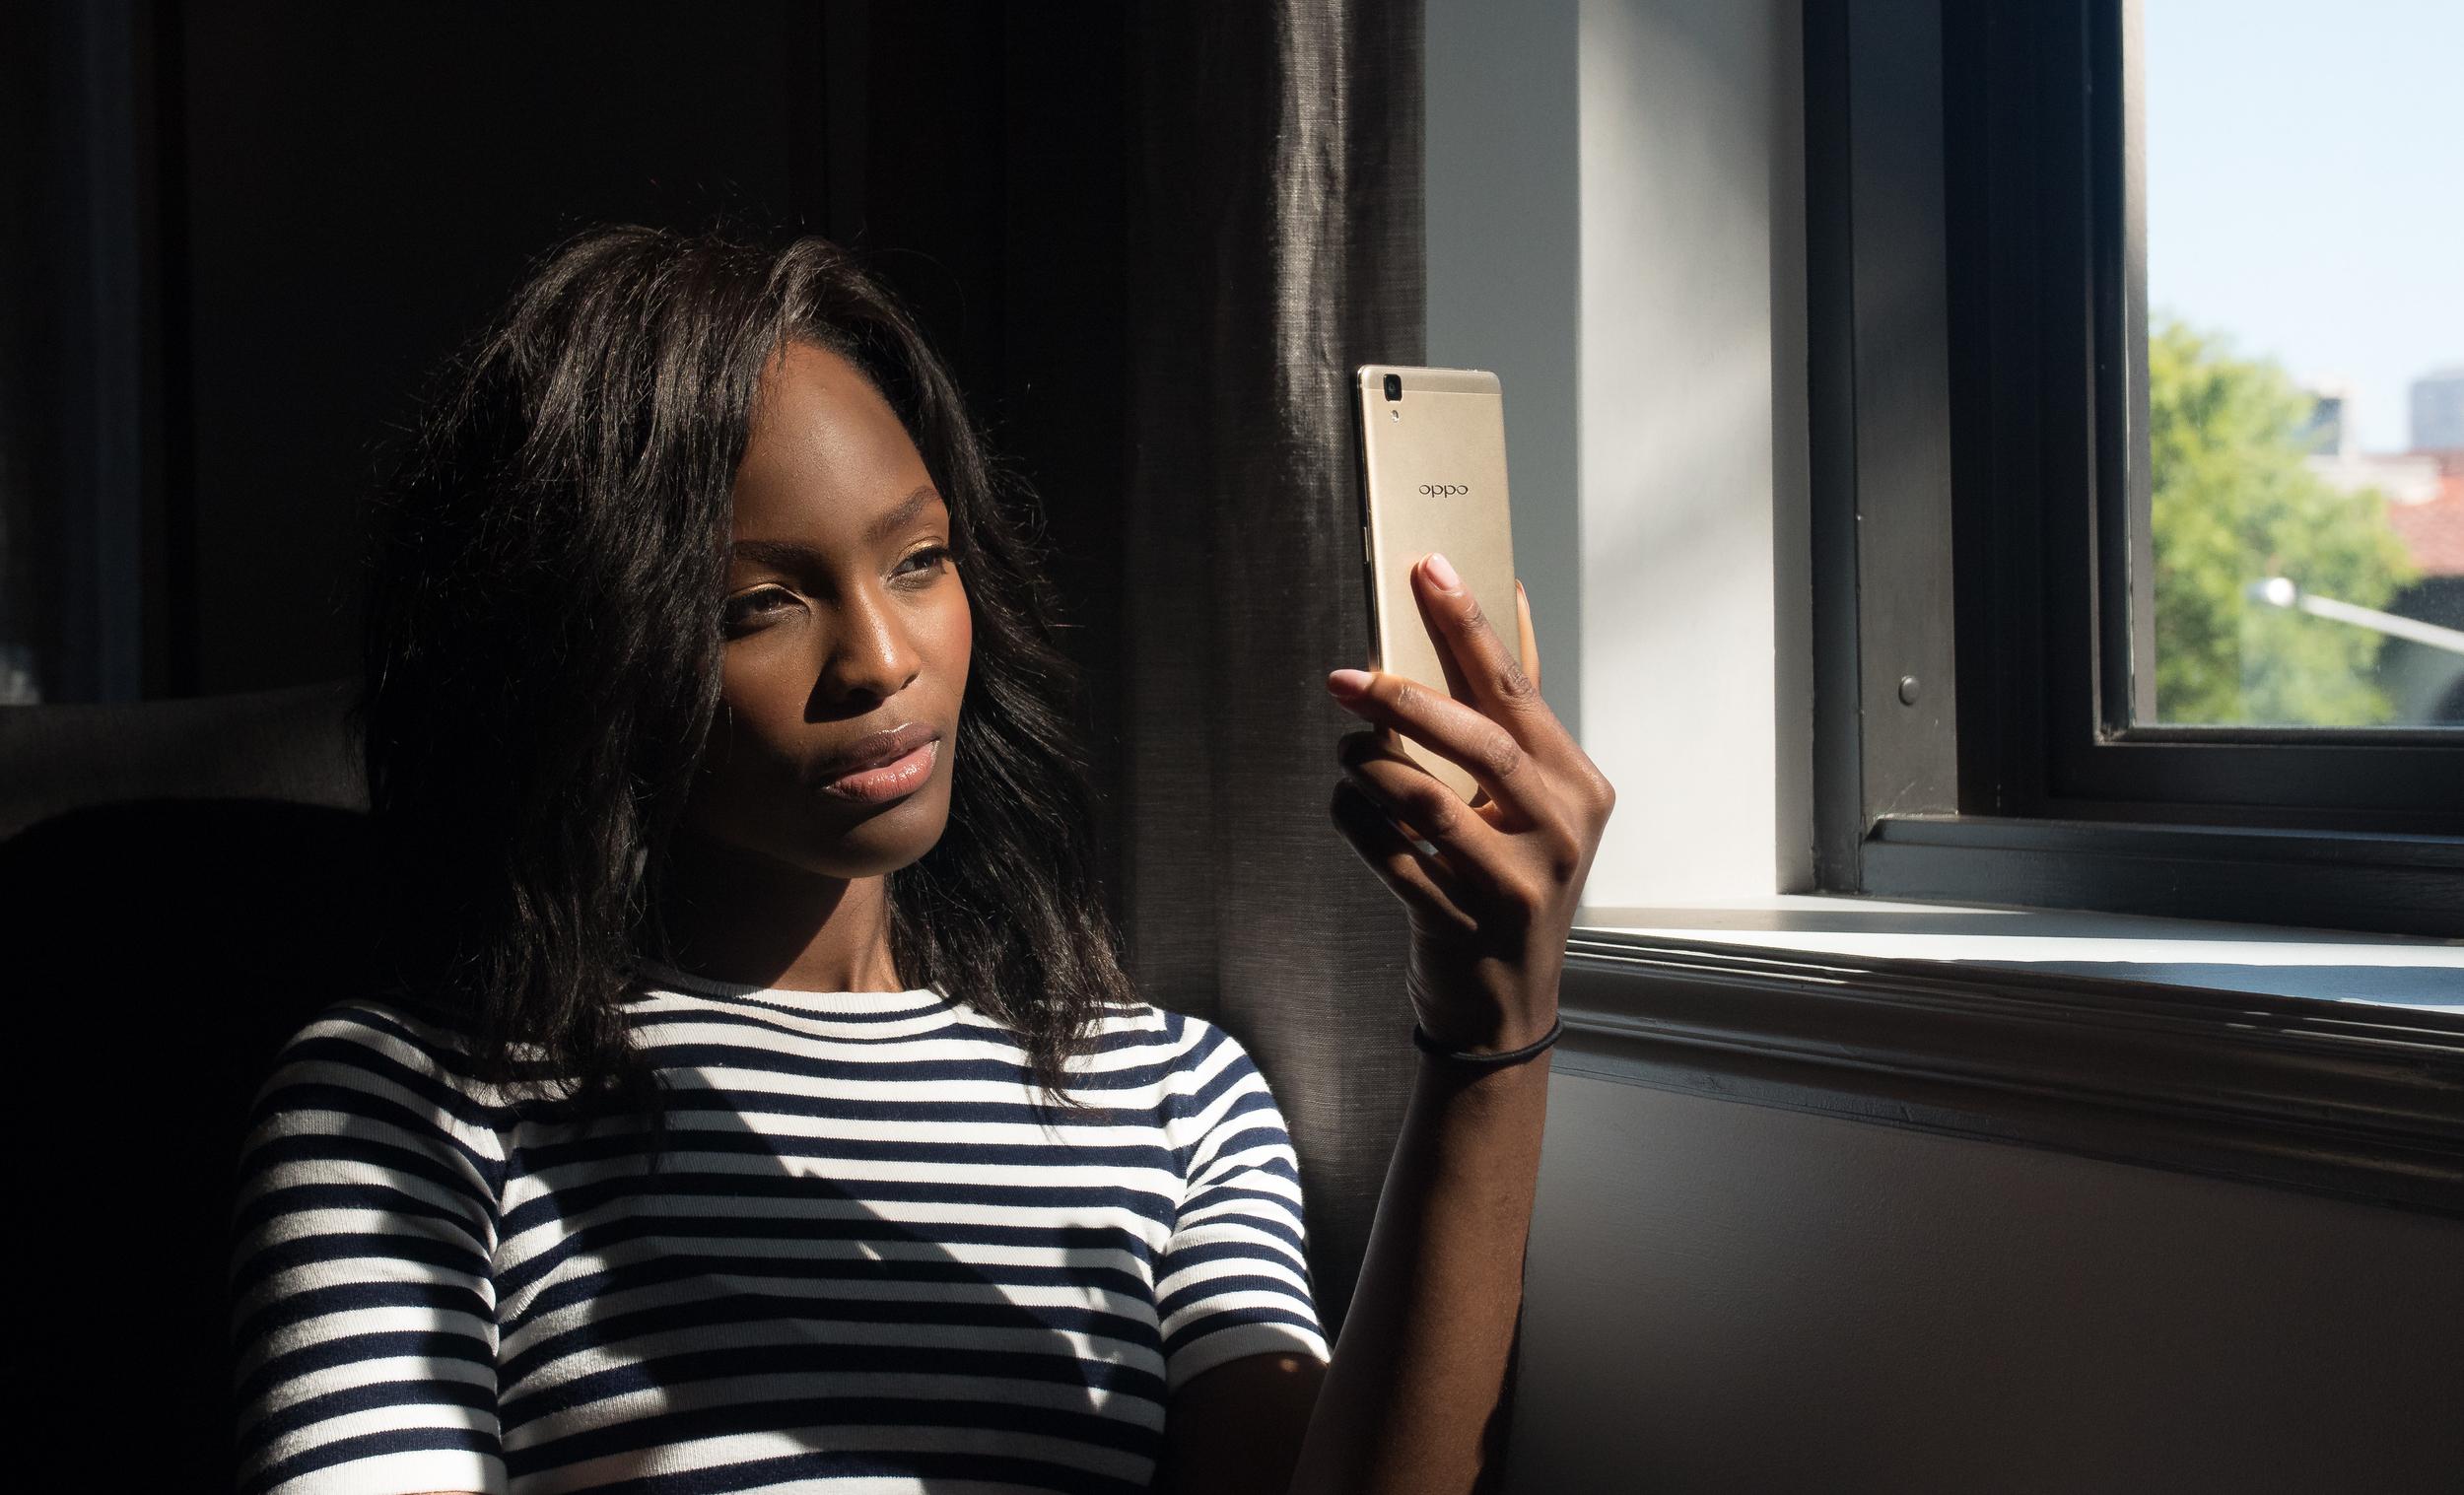 OPPO R7s Social Media Campaign shot on location in Sydney, Australia  Model: Mamé Adjei - America's Next Top Model   Shot with Panasonic Lumix GH4